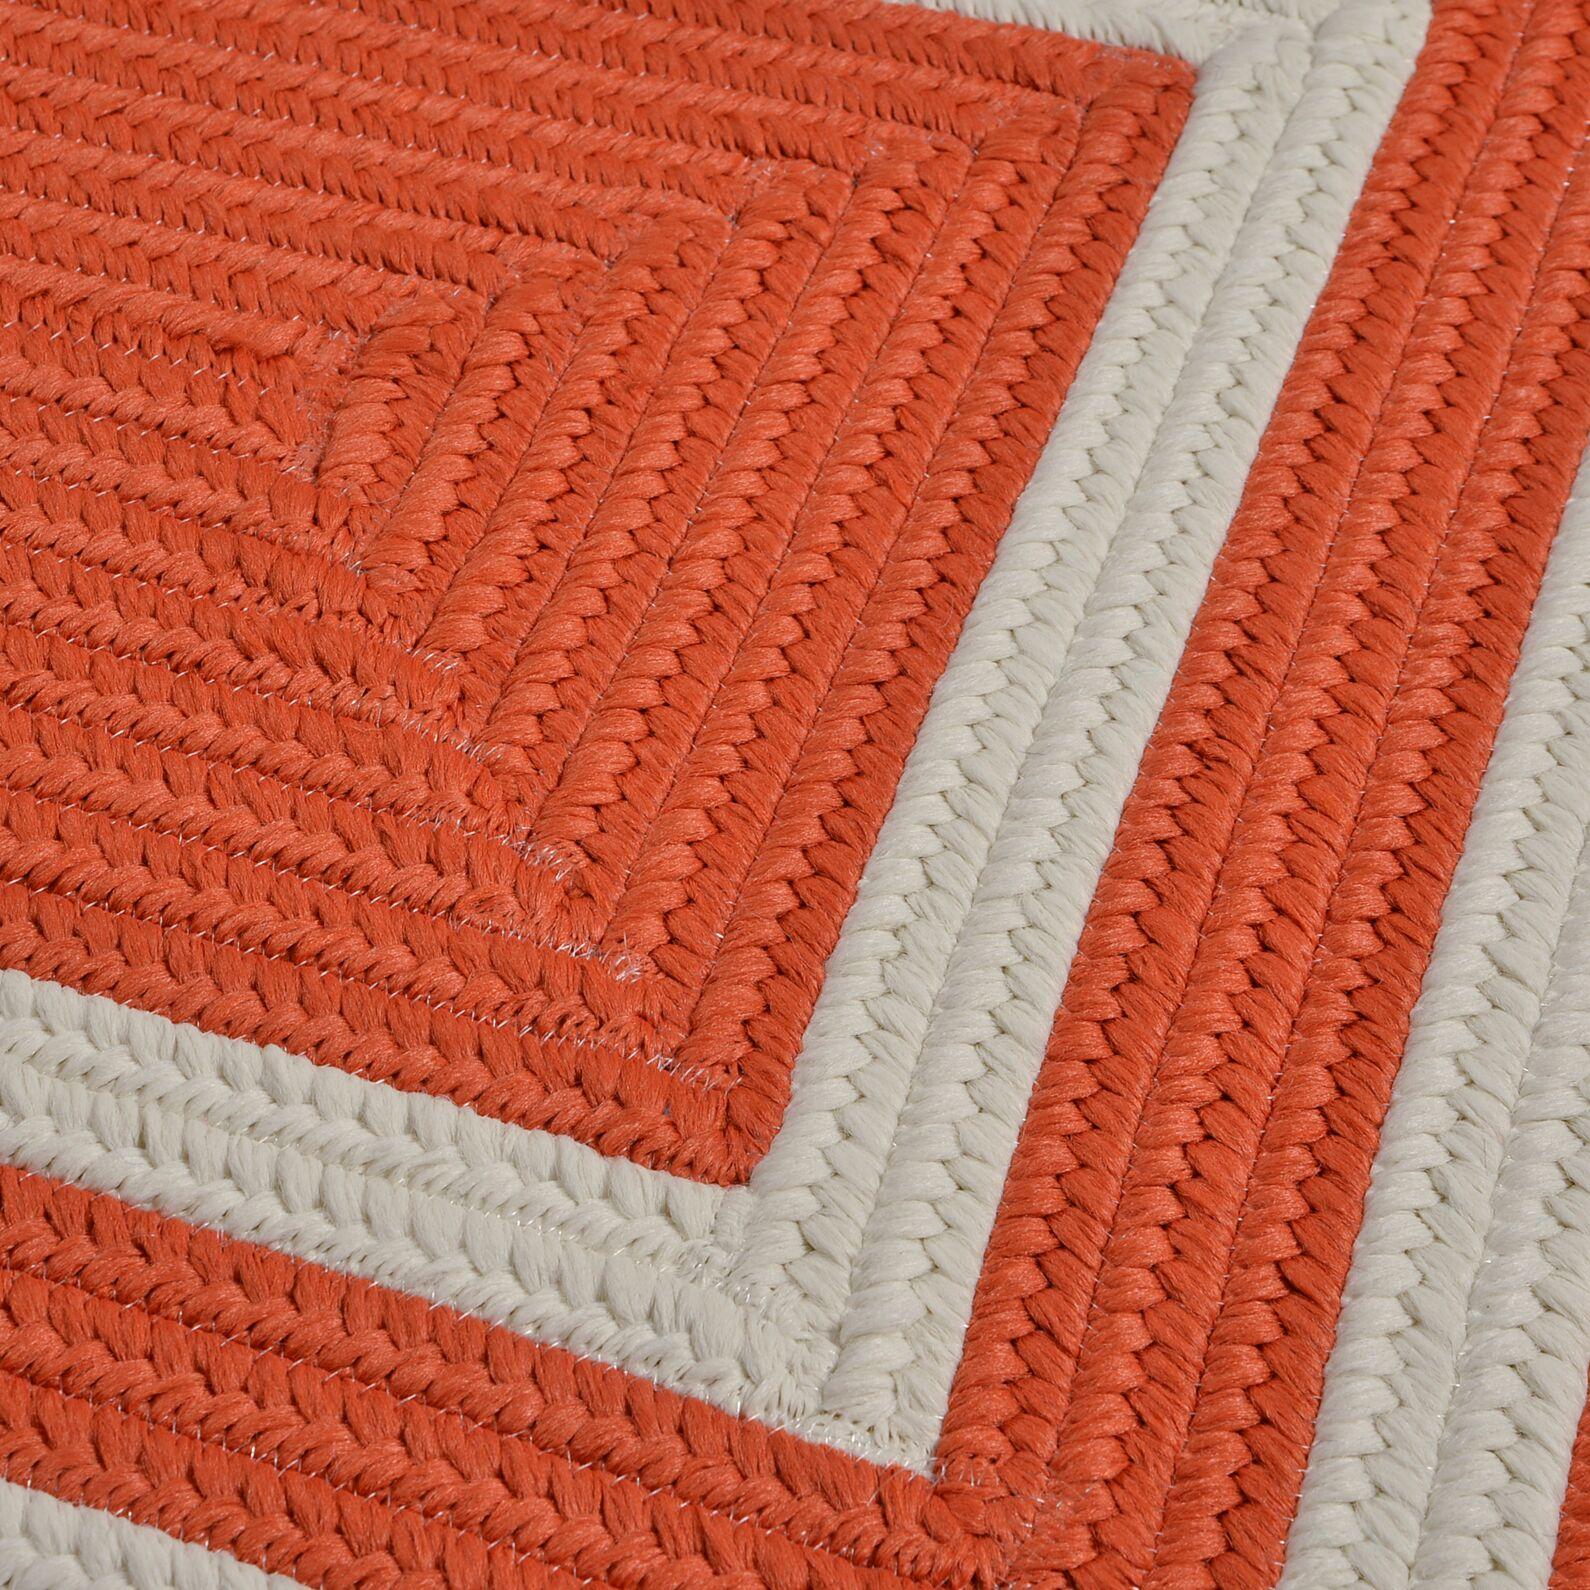 Marti Hand-Woven Outdoor Orange Area Rug Rug Size: Square 6'